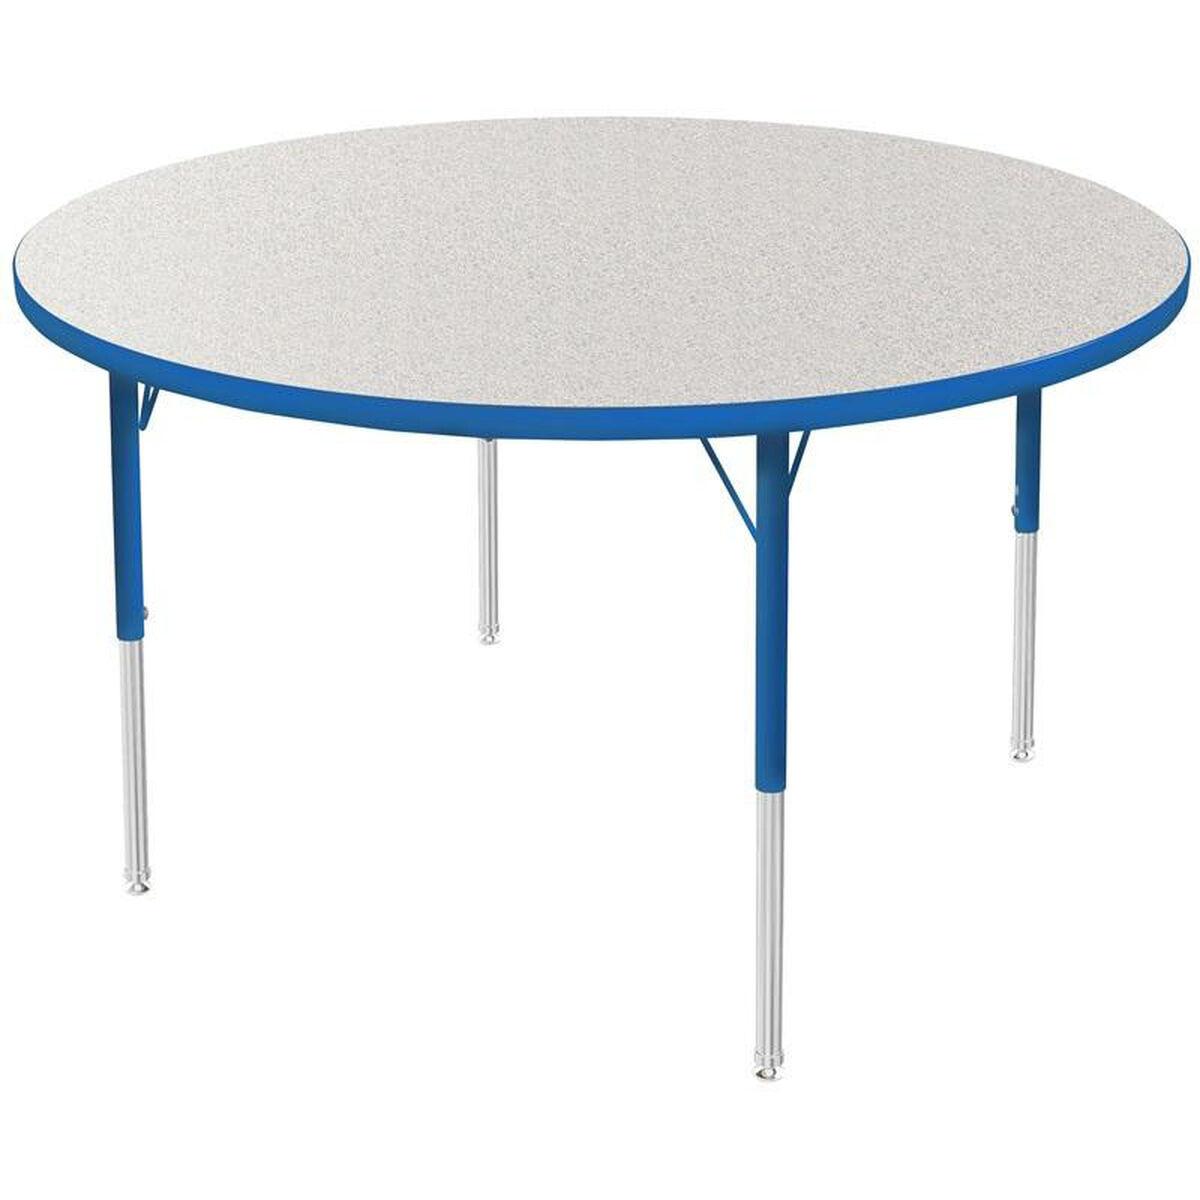 MG Round Kids Activity Table MG2244-51-ABLU   ChurchChairs4Less.com